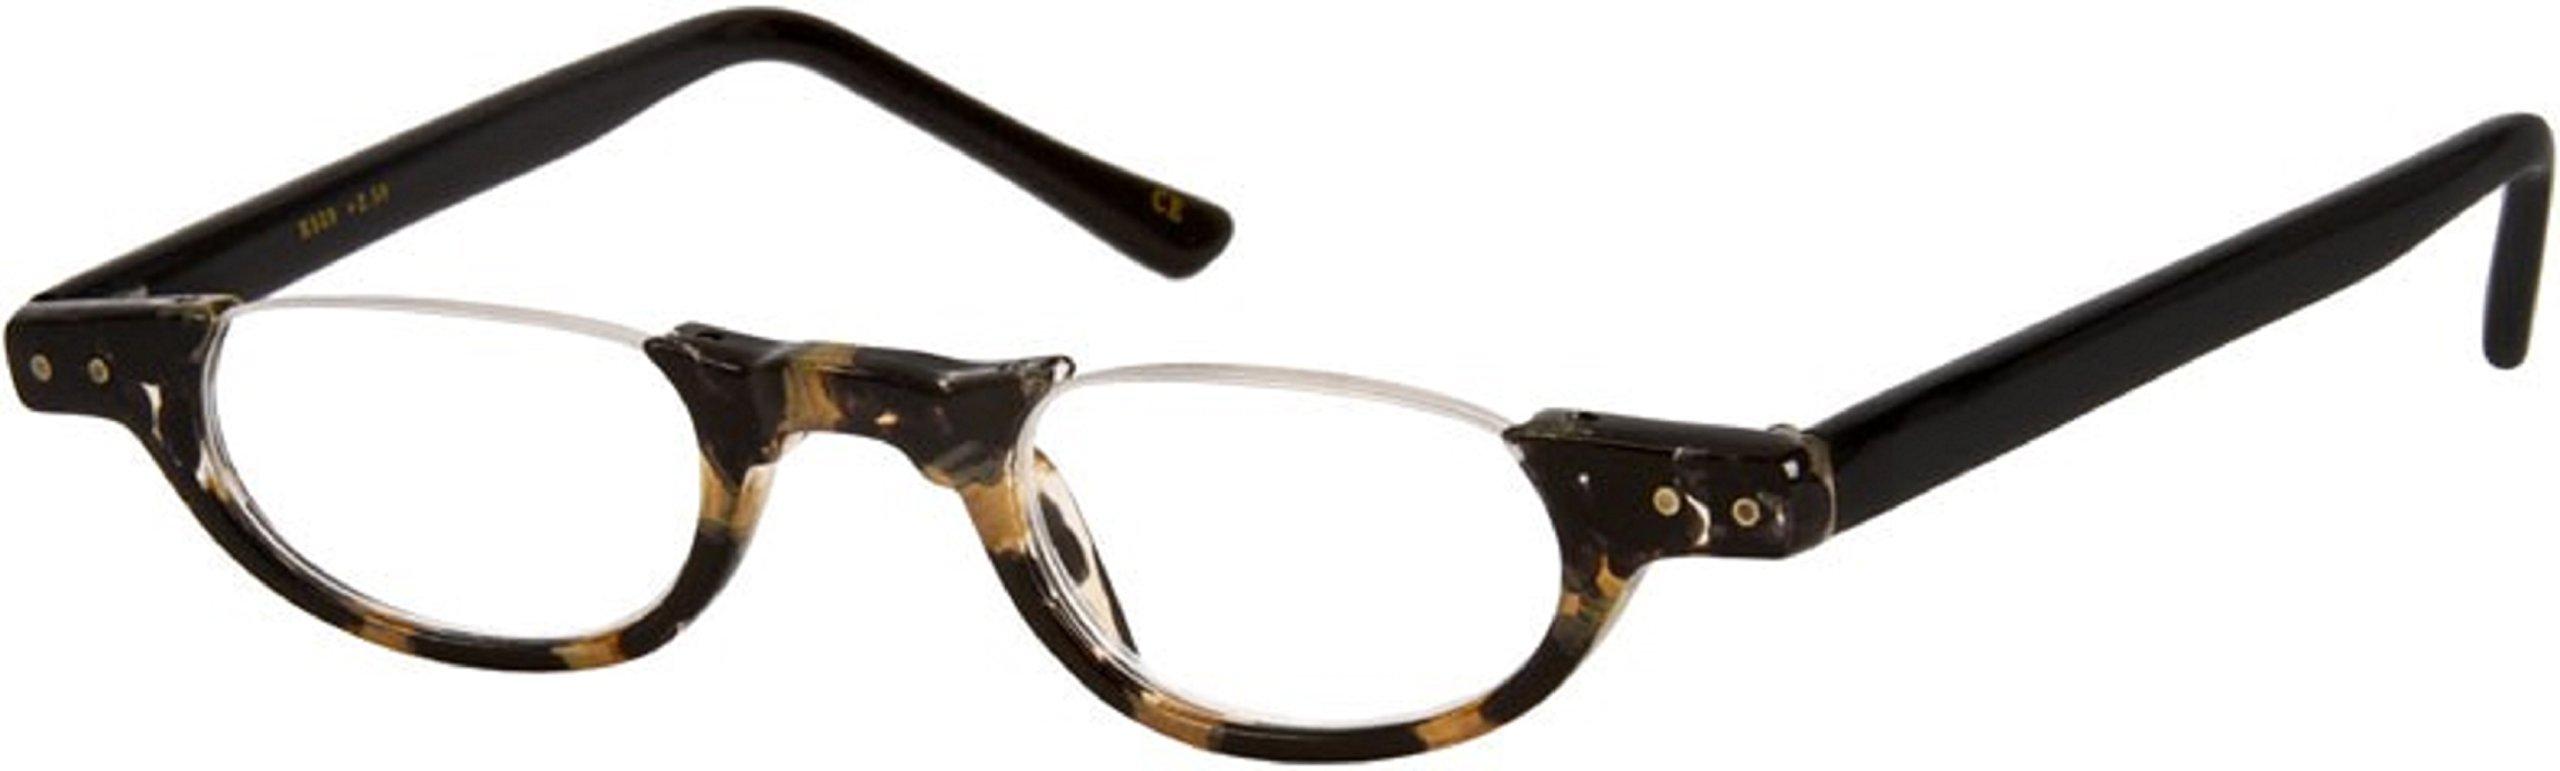 f722c3b204b5 The Hunter Colorful Retro Half Under Frame Rimless Round Vintage Reading  Glasses +1.50 Black and